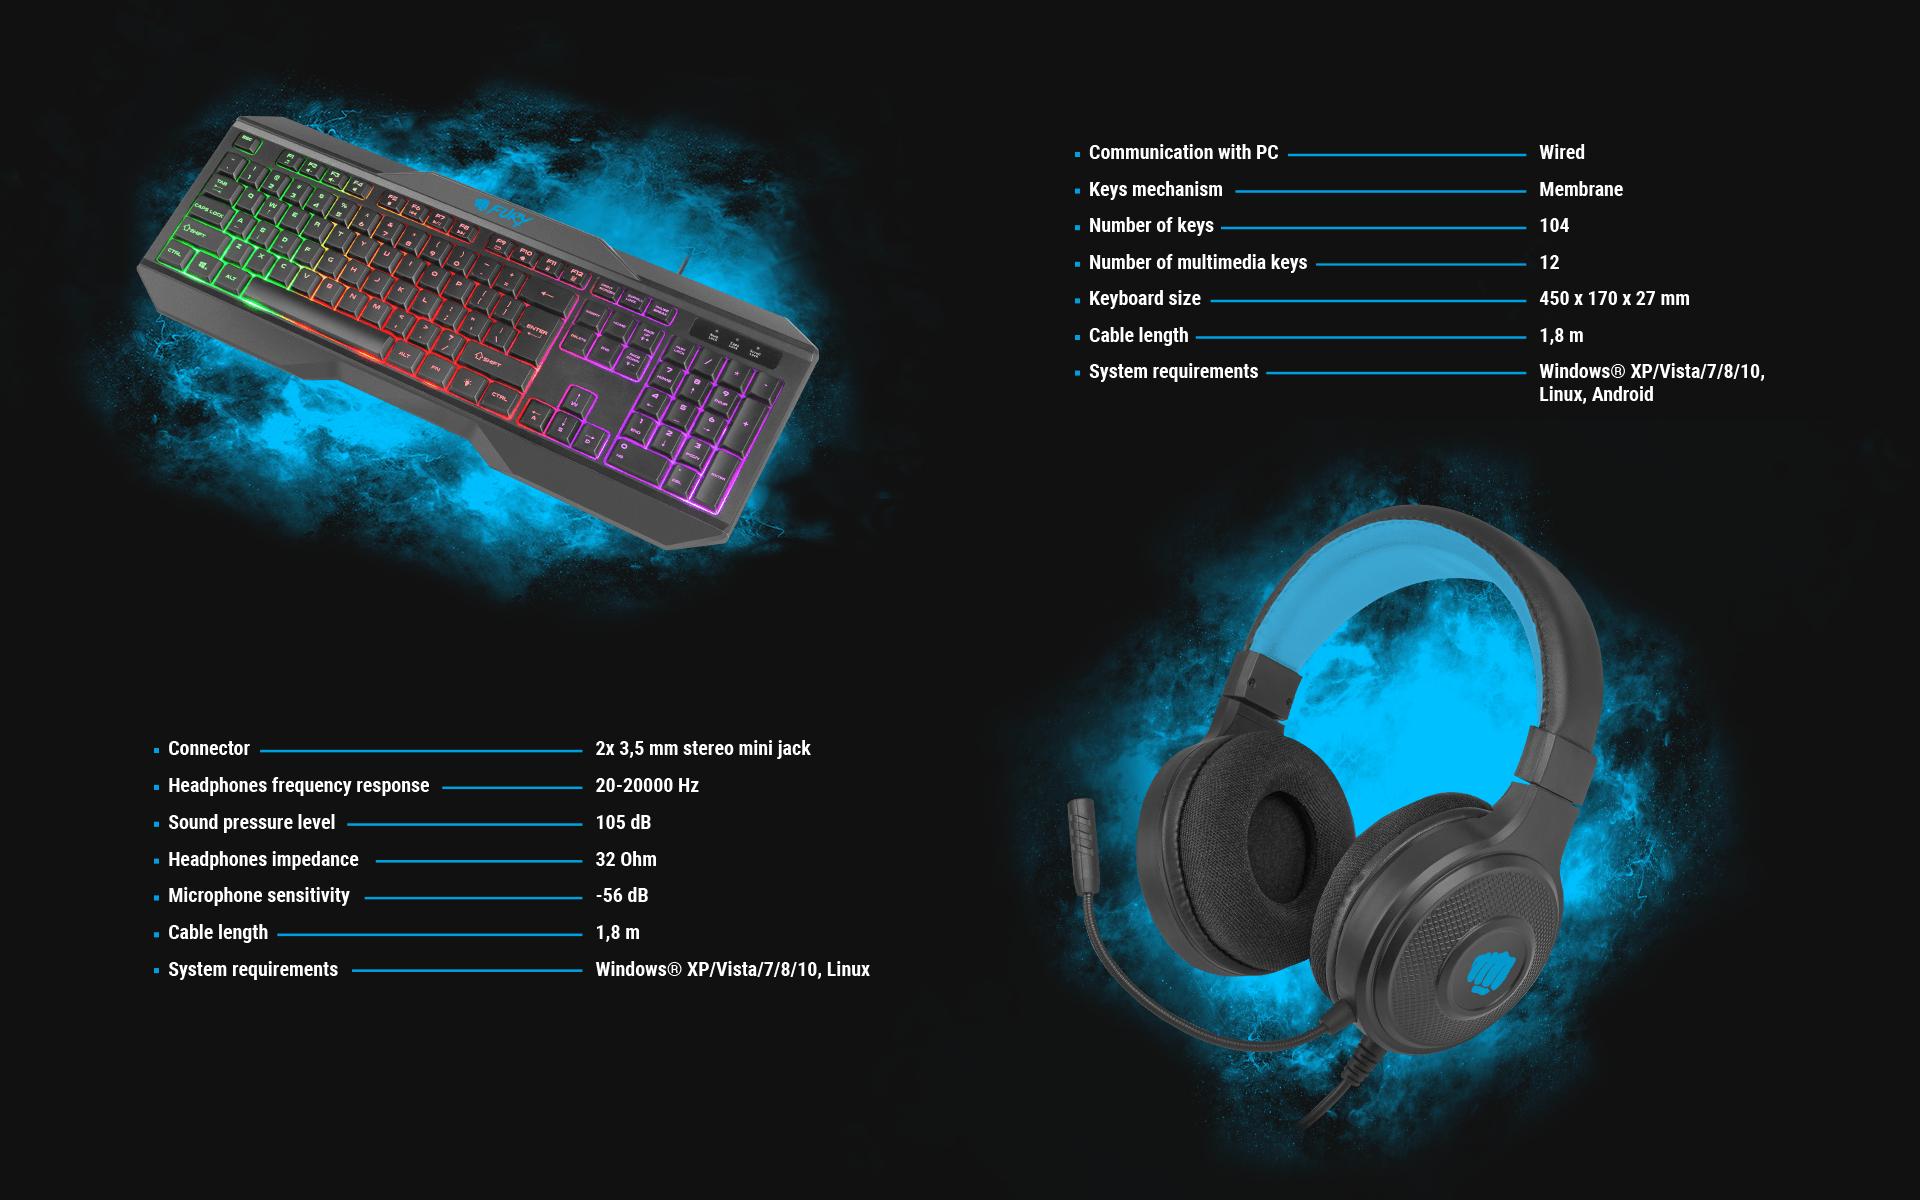 gaming combo set 4in1 fury thunderstreak 3.0 cz/sk keyboard + mouse + headphones + mousepad, cz/sk 8